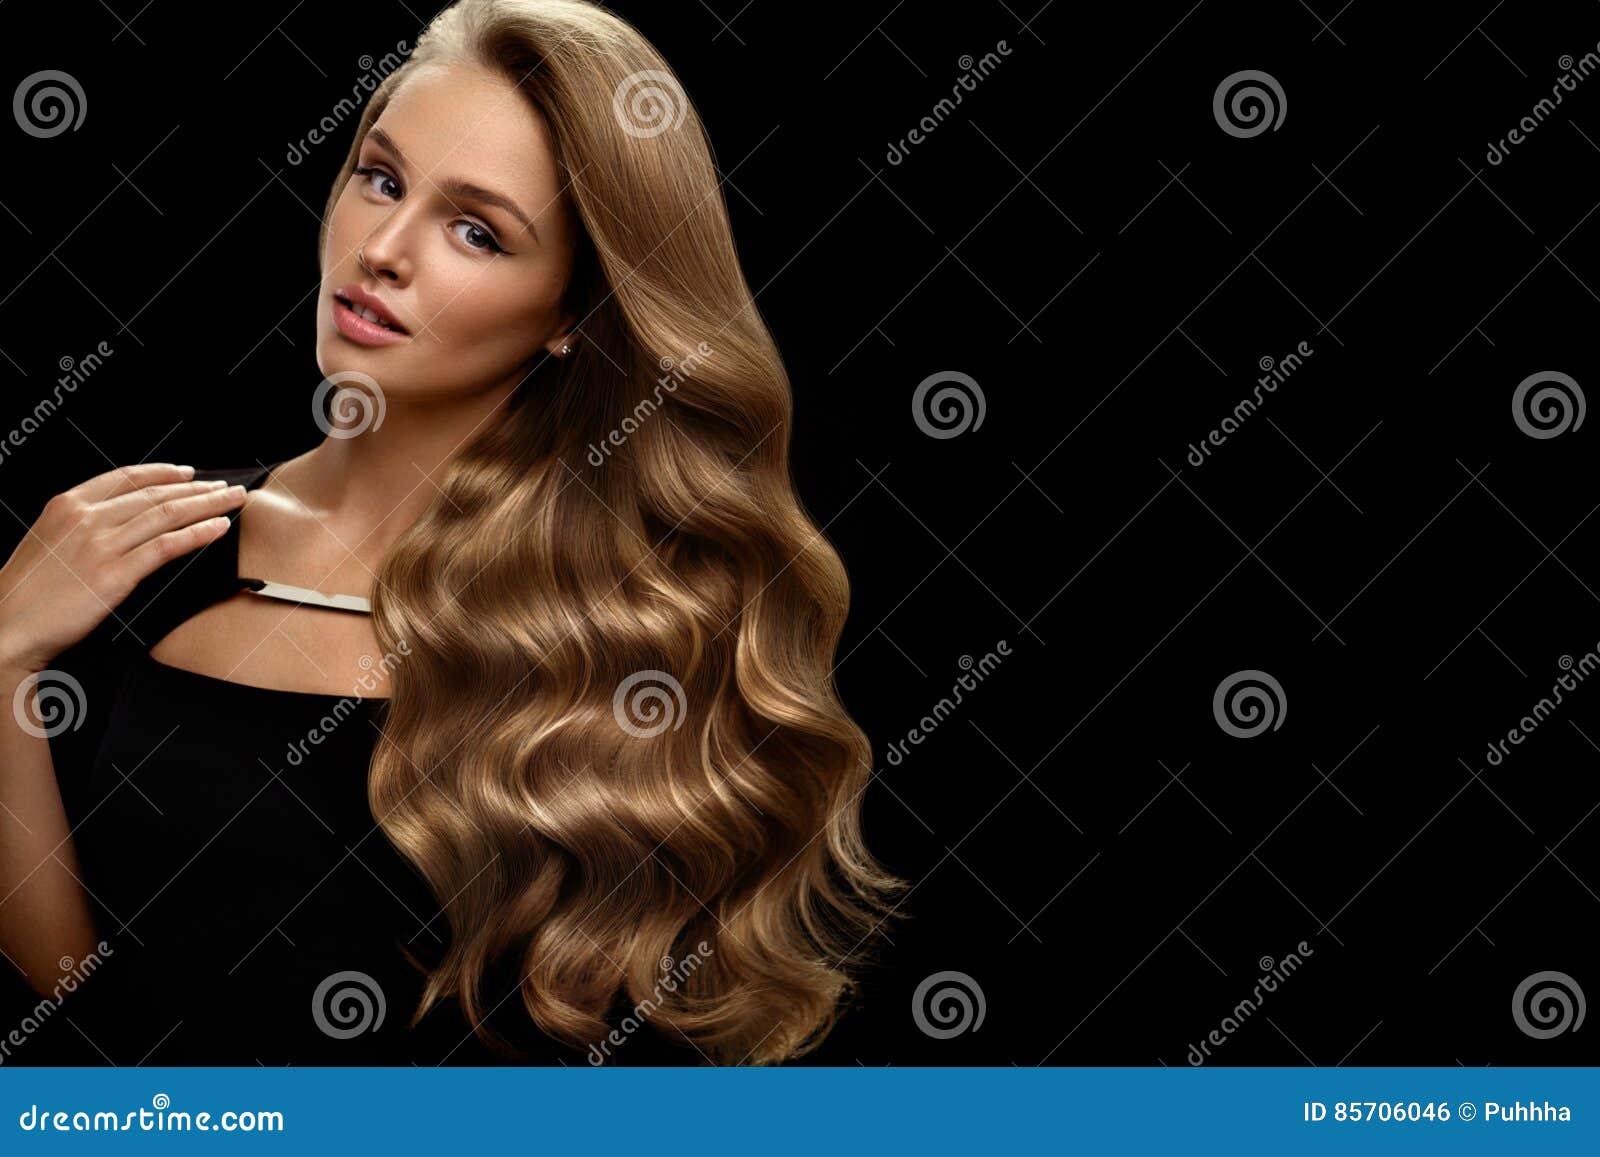 Mooi lang haar Haar van vrouwen het Modelwith blonde curly